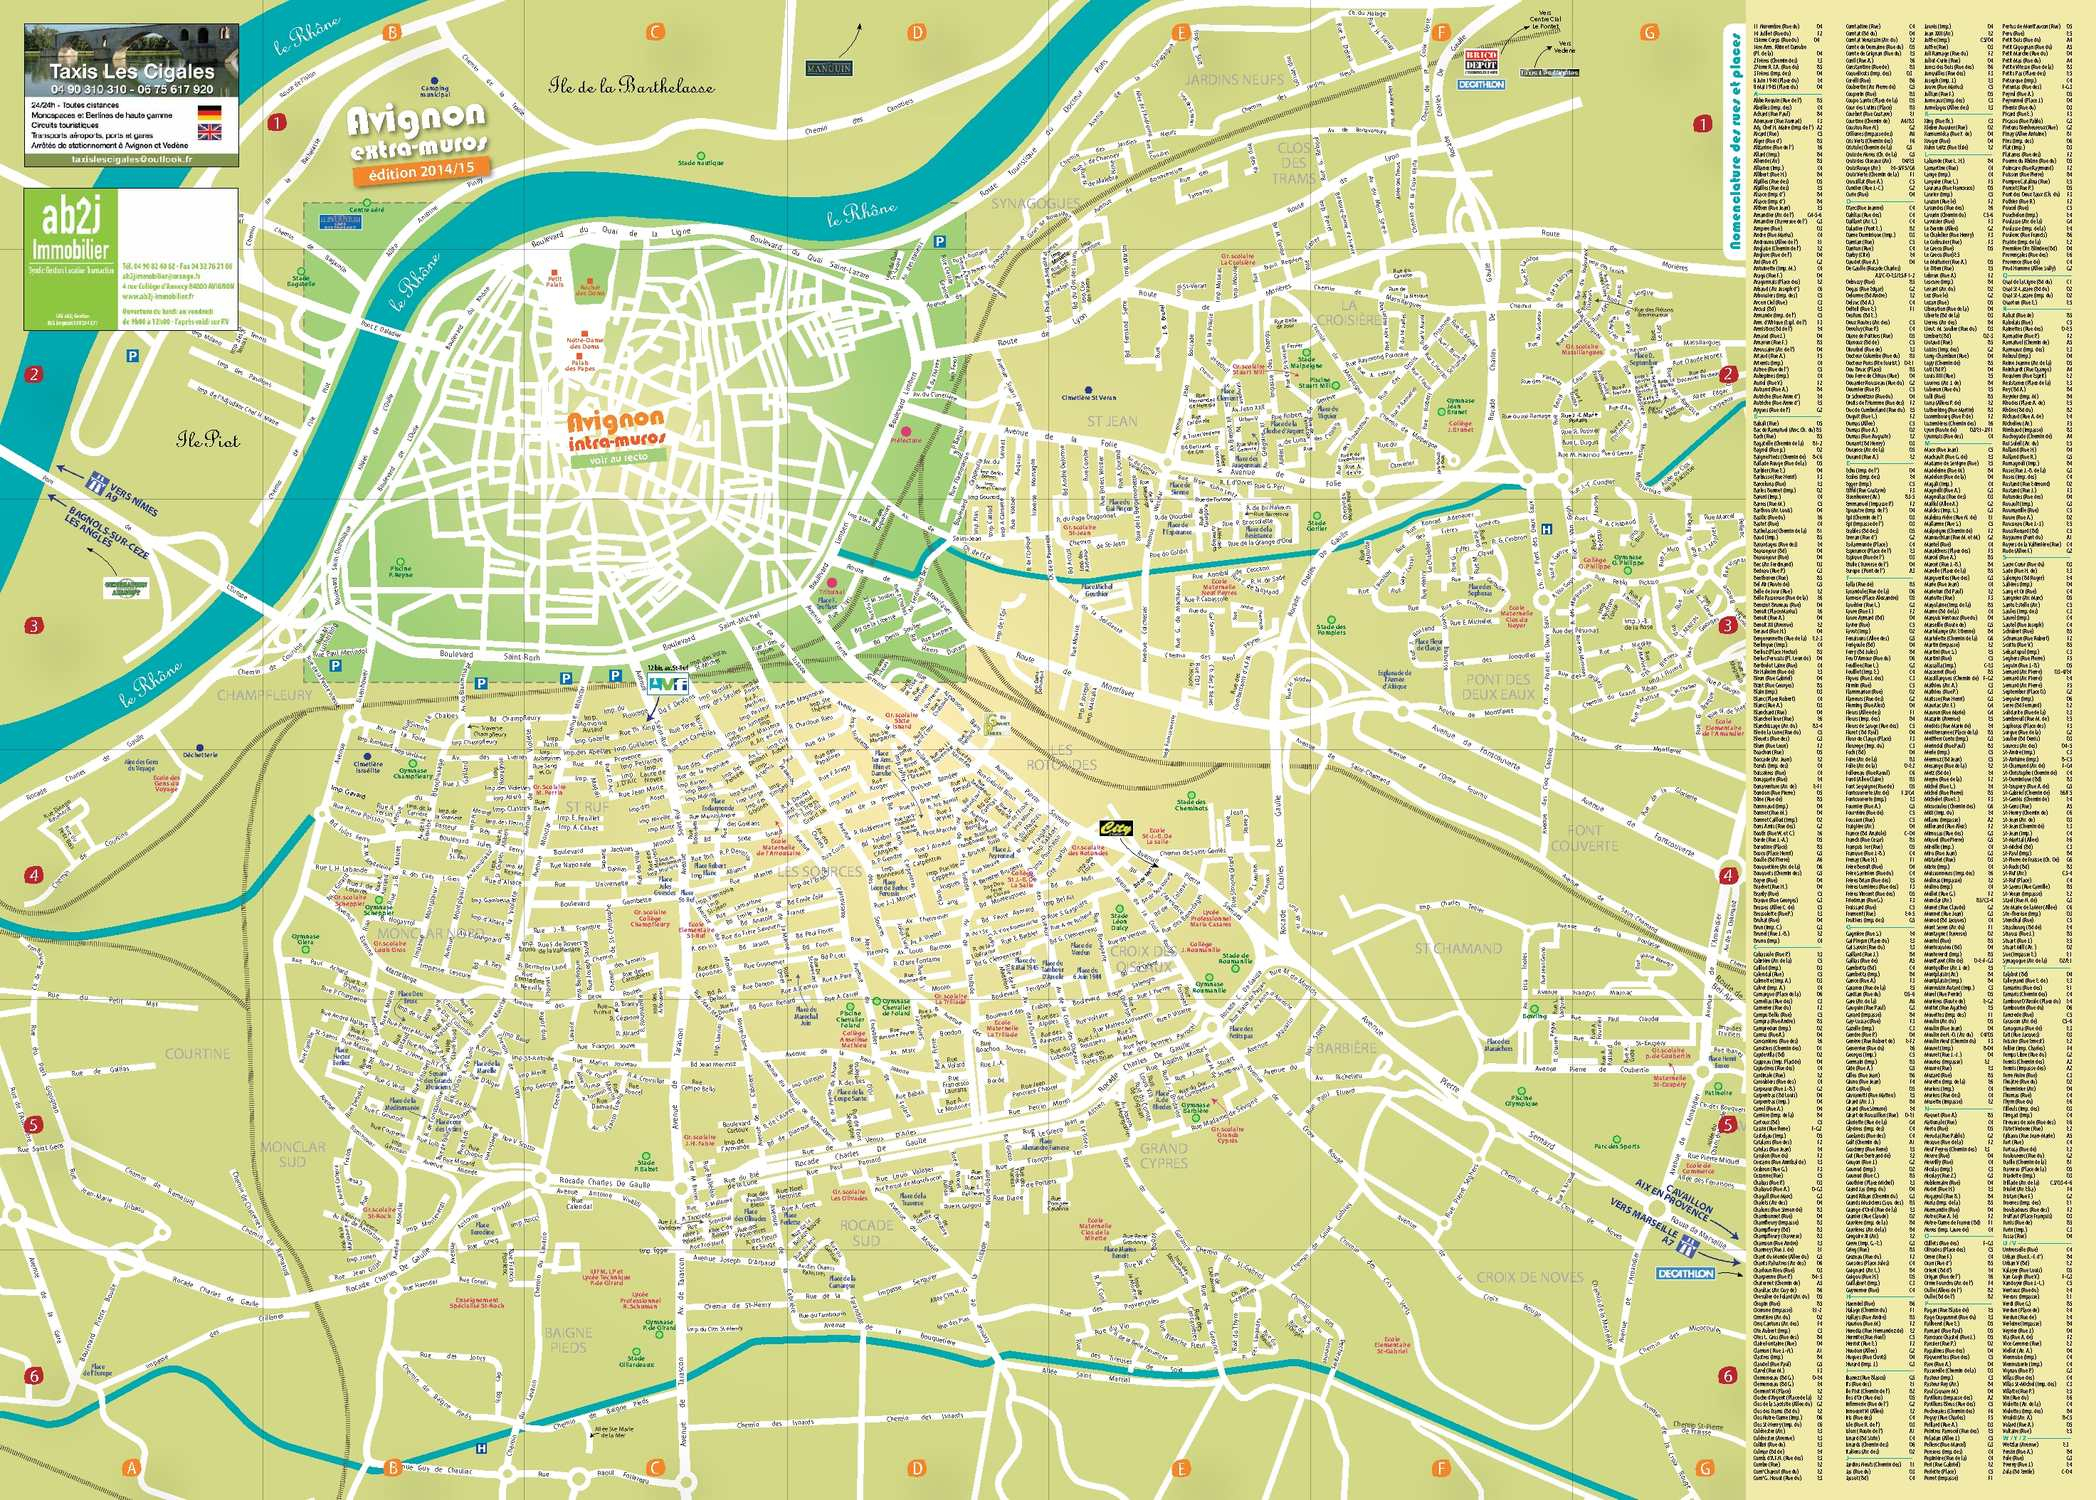 Calaméo - Avignon Plan Elargi destiné Piscine Stuart Mill Avignon